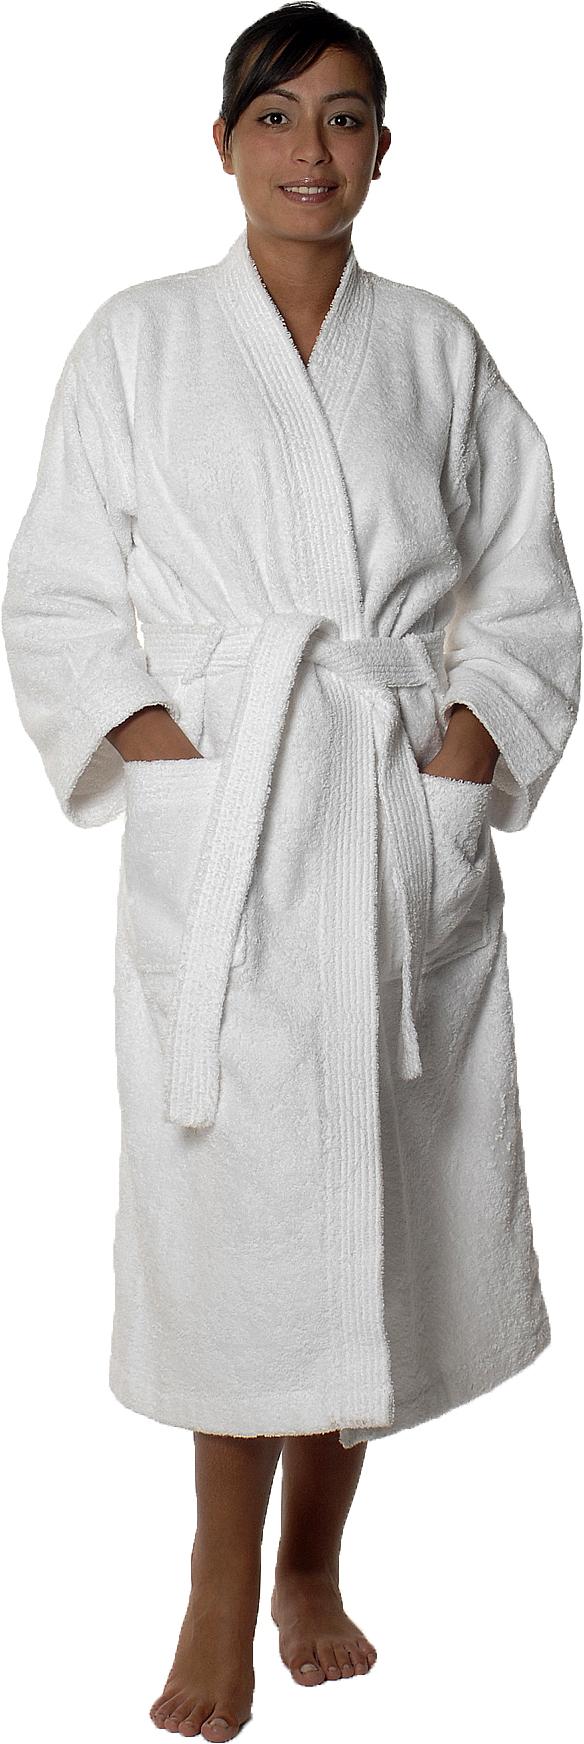 Peignoir col kimono en Coton couleur Blanc Taille S (Blanc)